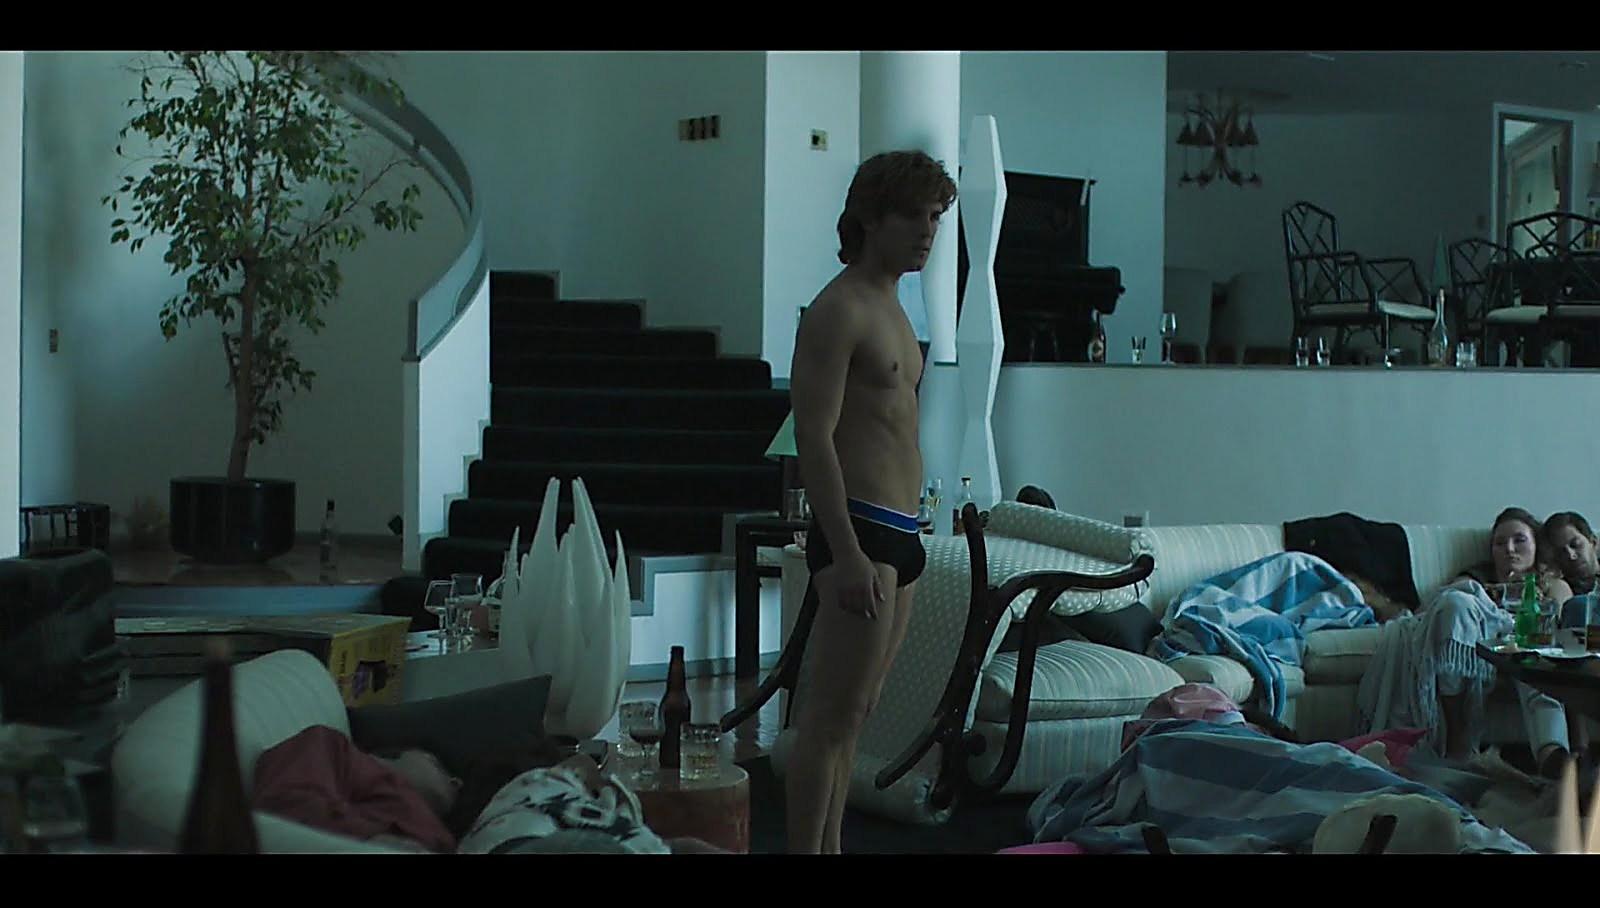 Diego Boneta sexy shirtless scene May 28, 2018, 11am